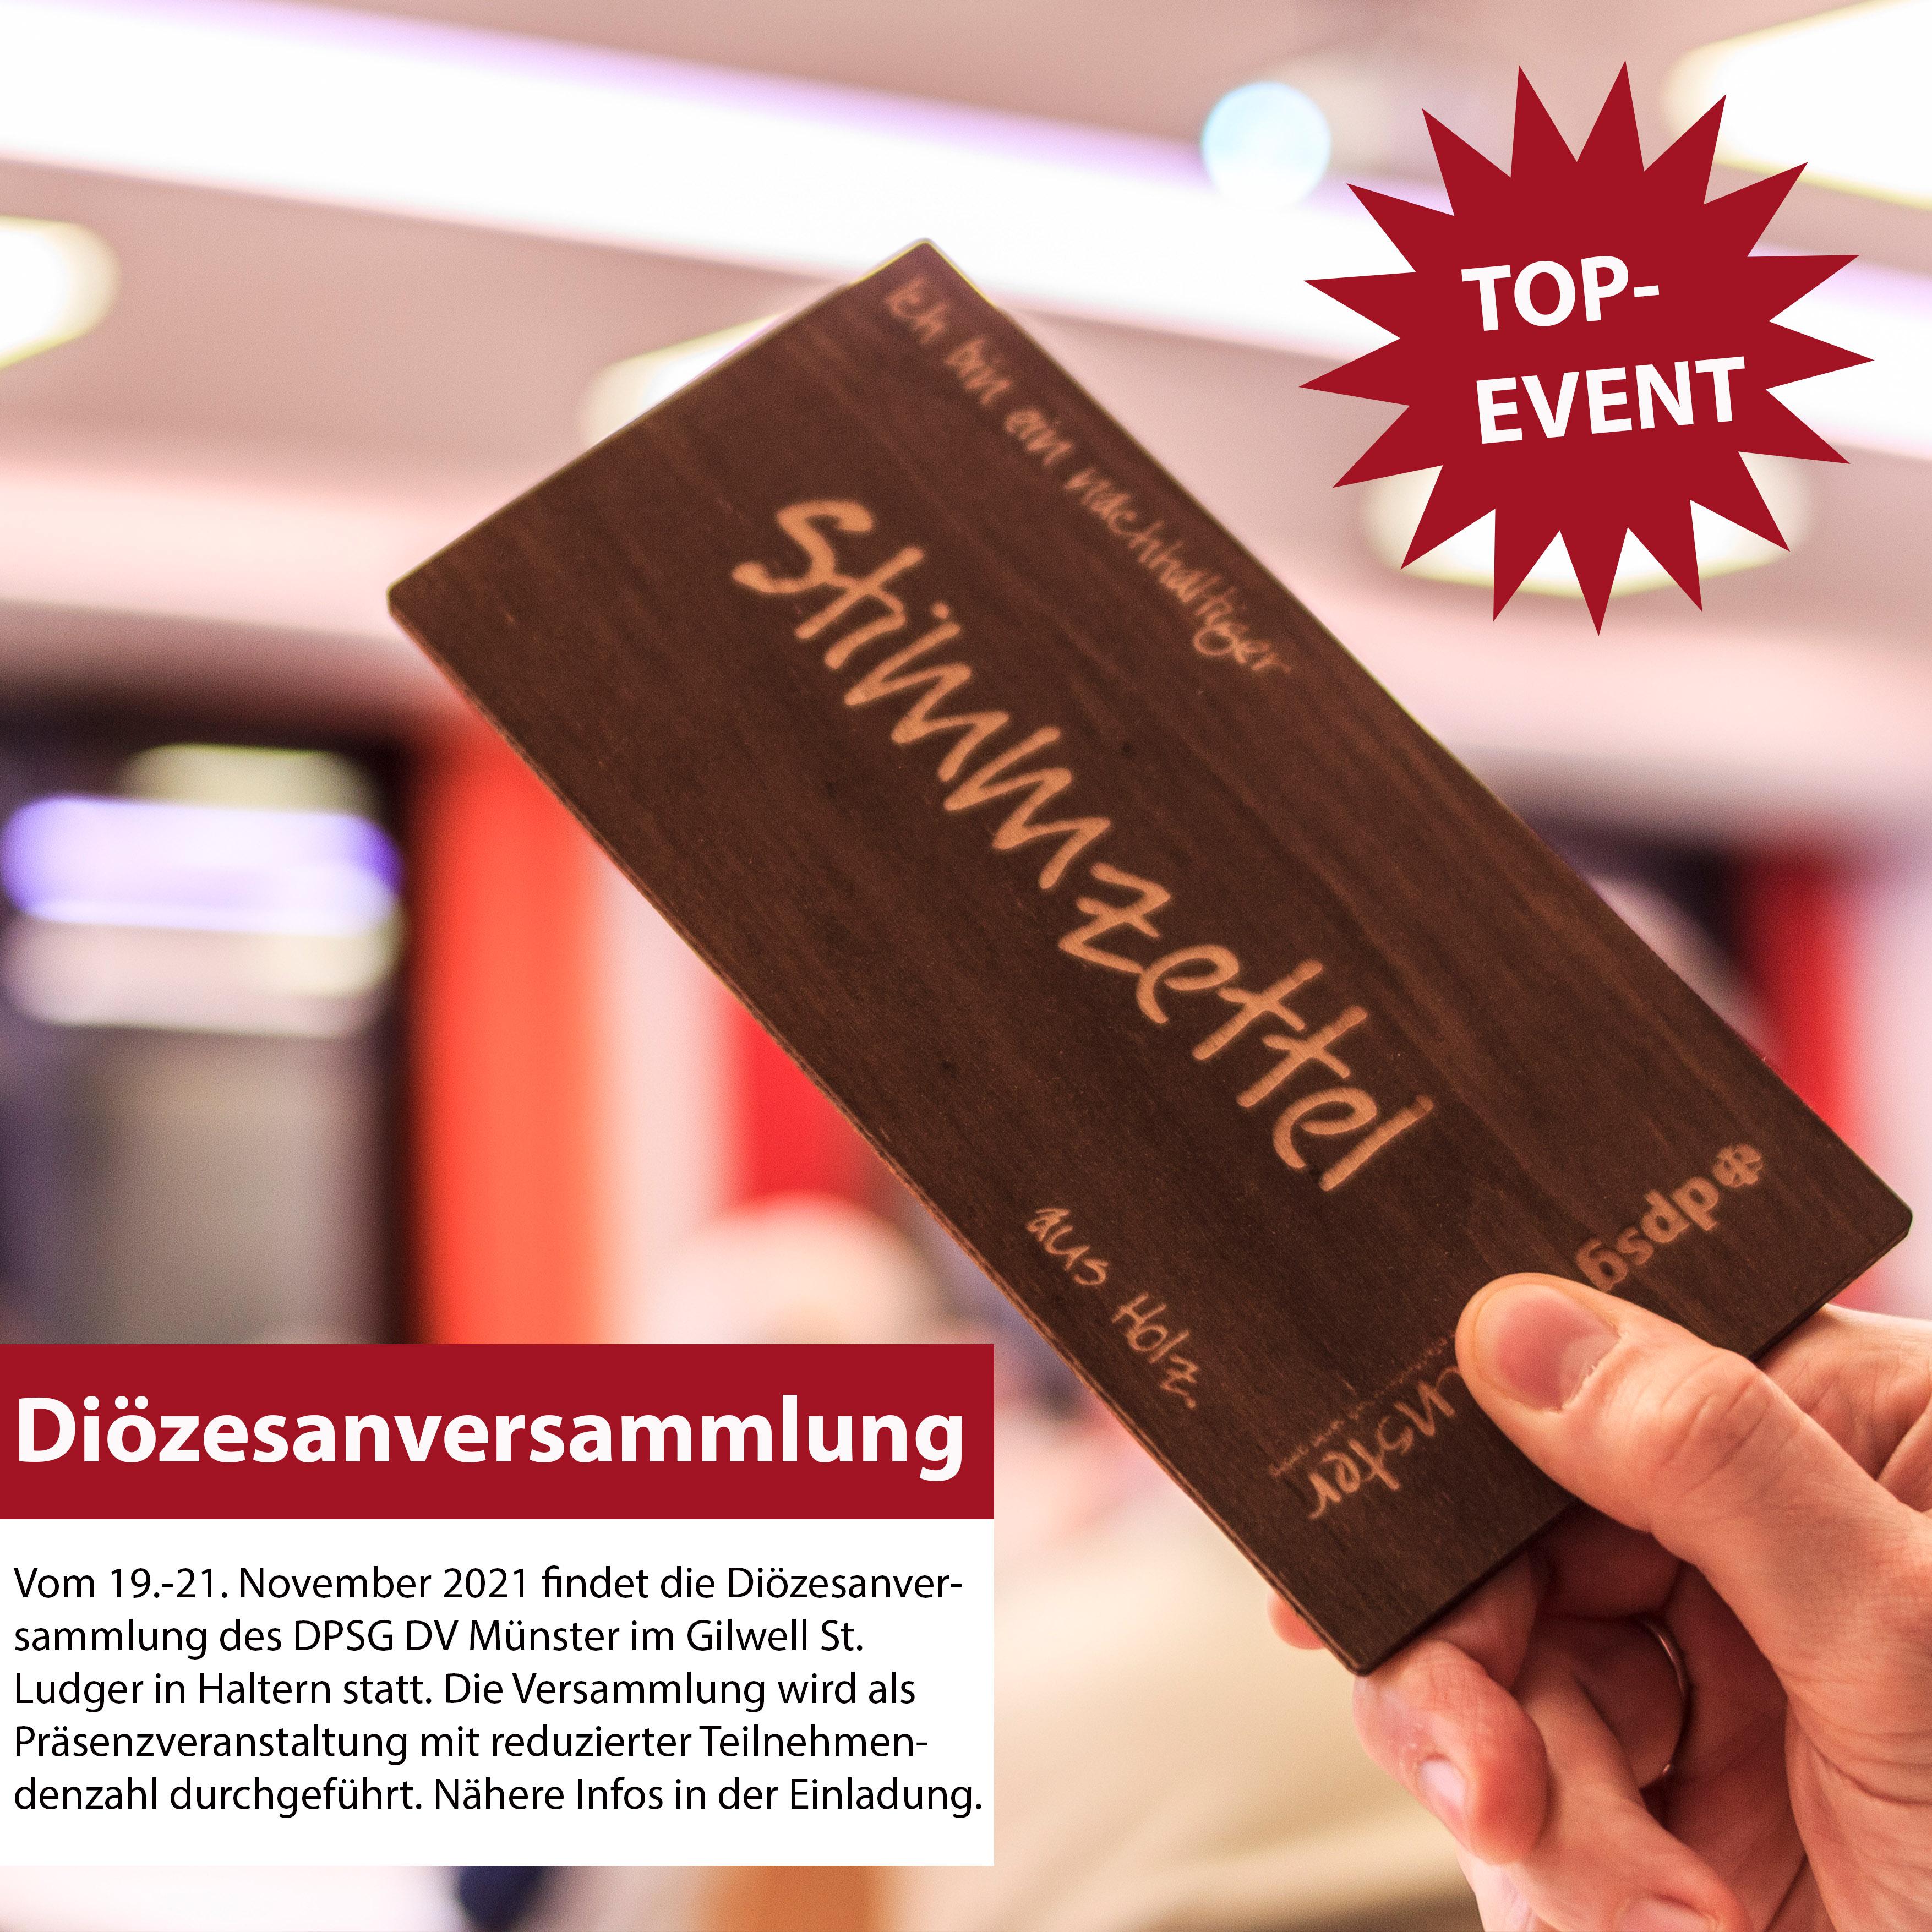 Top-Event_dv_2021.jpg